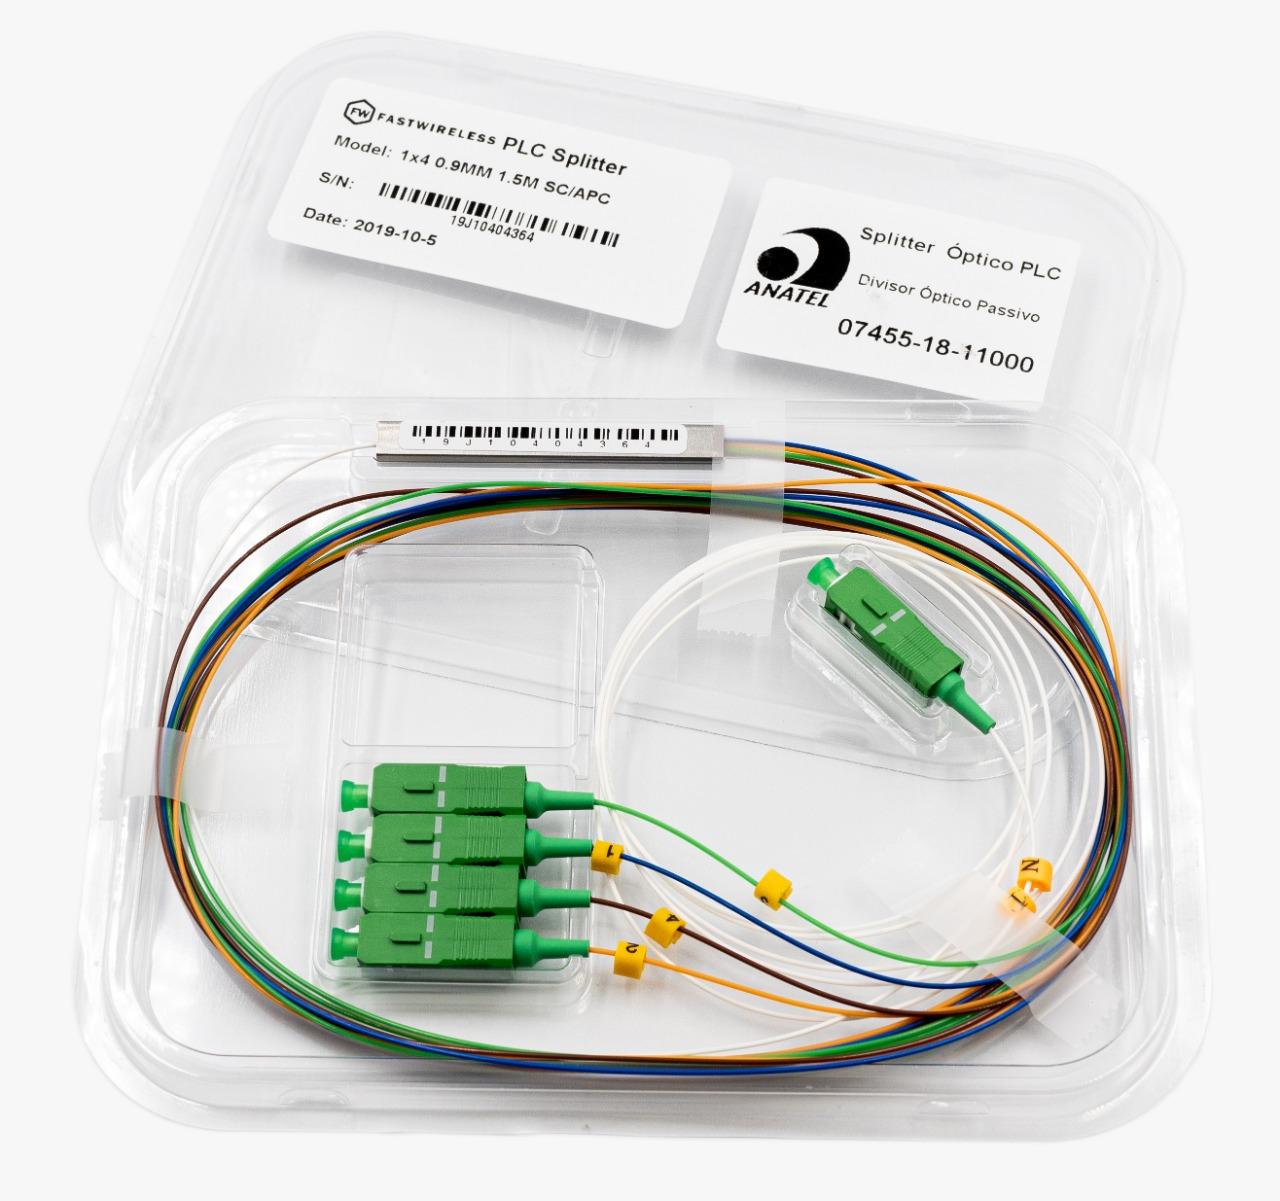 Splitter Óptico PLC 1x4 SC/APC Verde  - FASTWIRELESS